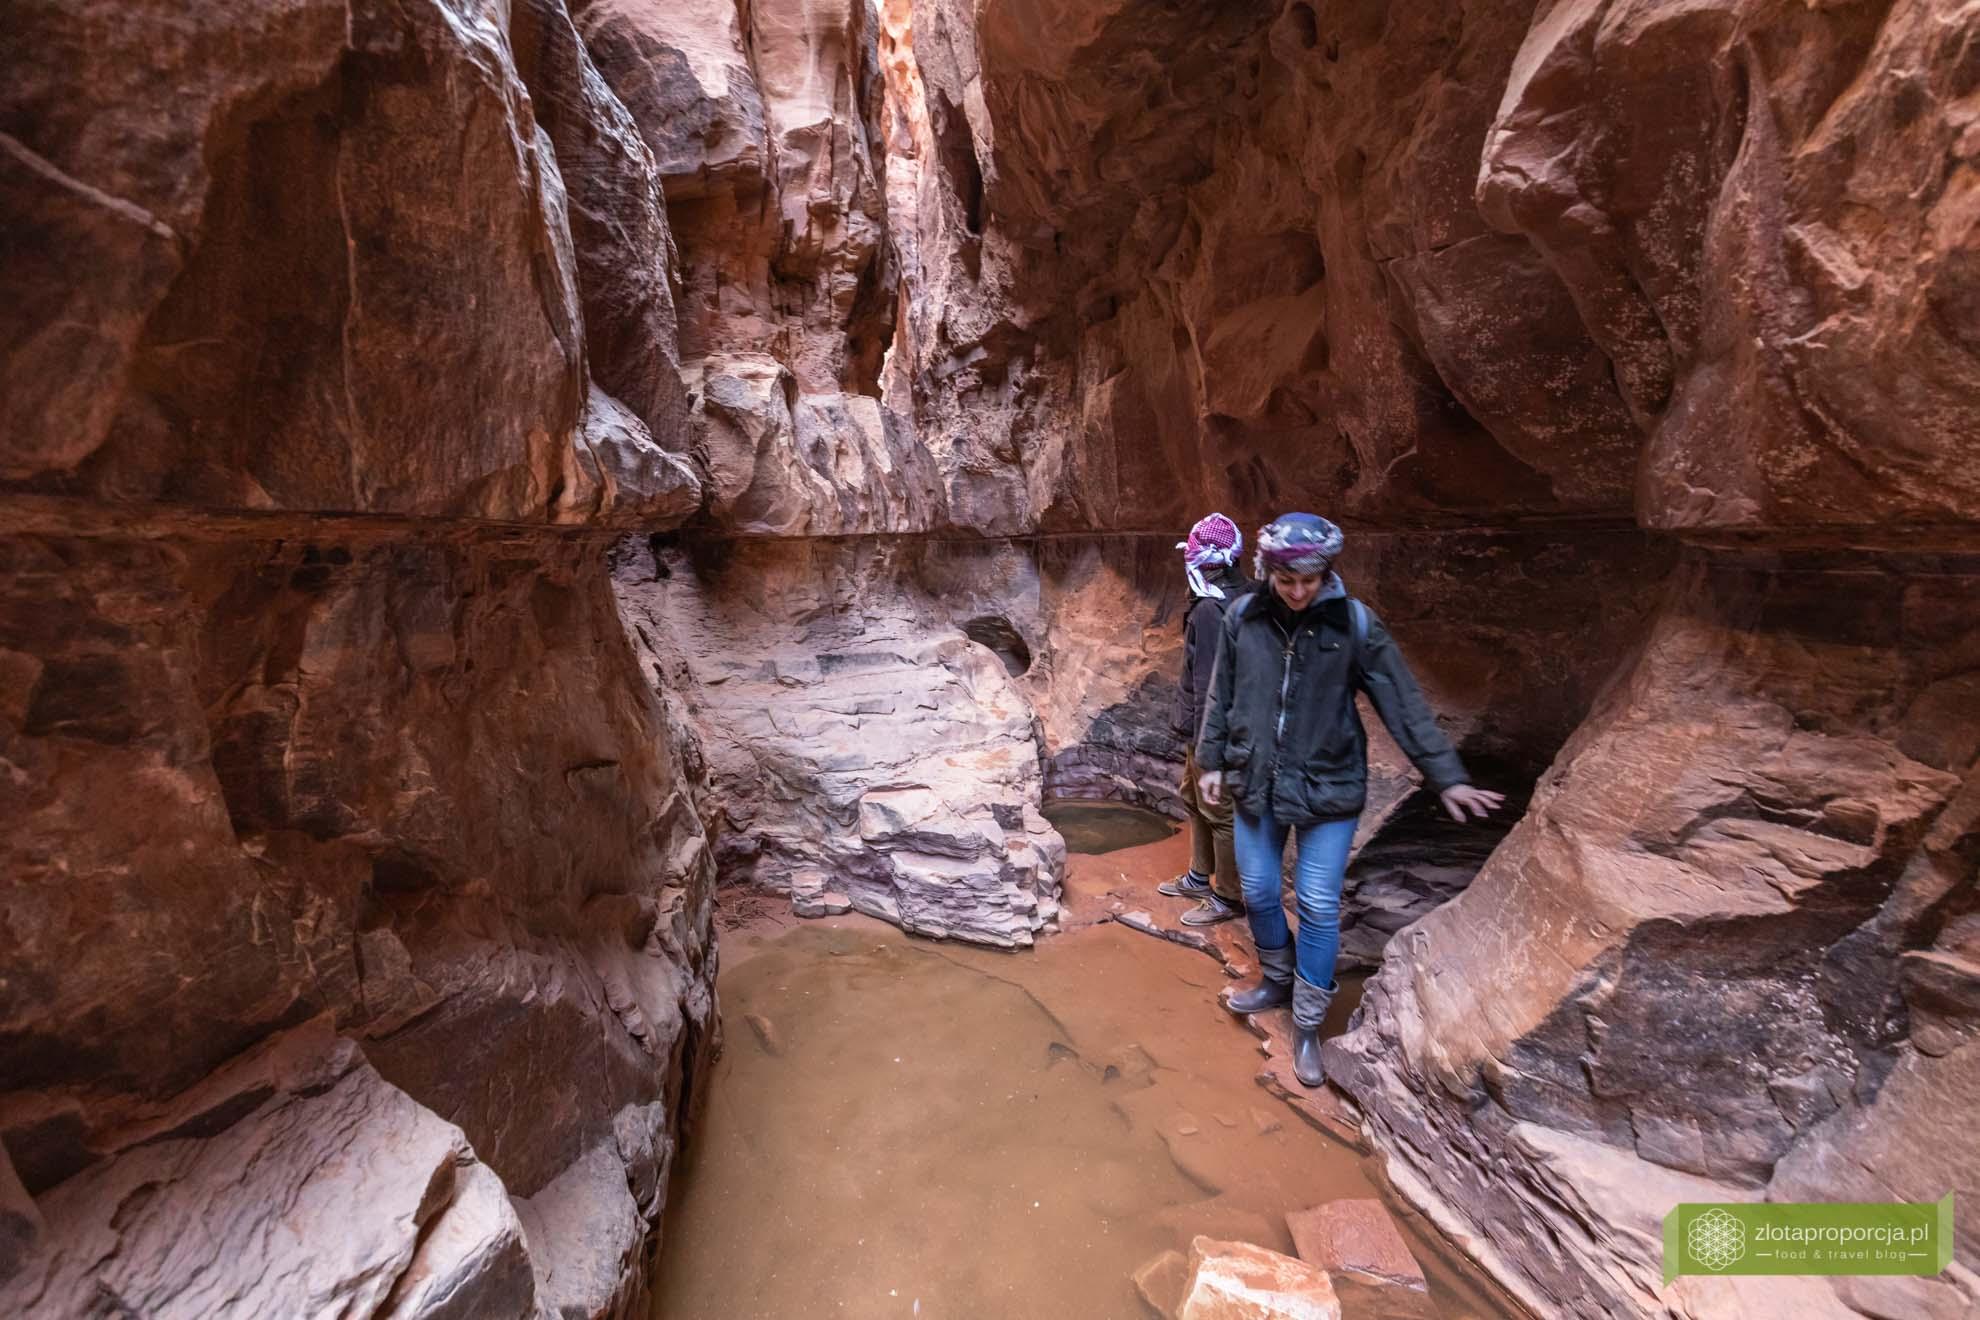 Wadi Rum, pustynia Wadi Rum, Jordania, pustynia Jordania; Wadi rum wycieczka, Wadi Rum zwiedzanie, Jordania atrakcje; Kanion Khazali;